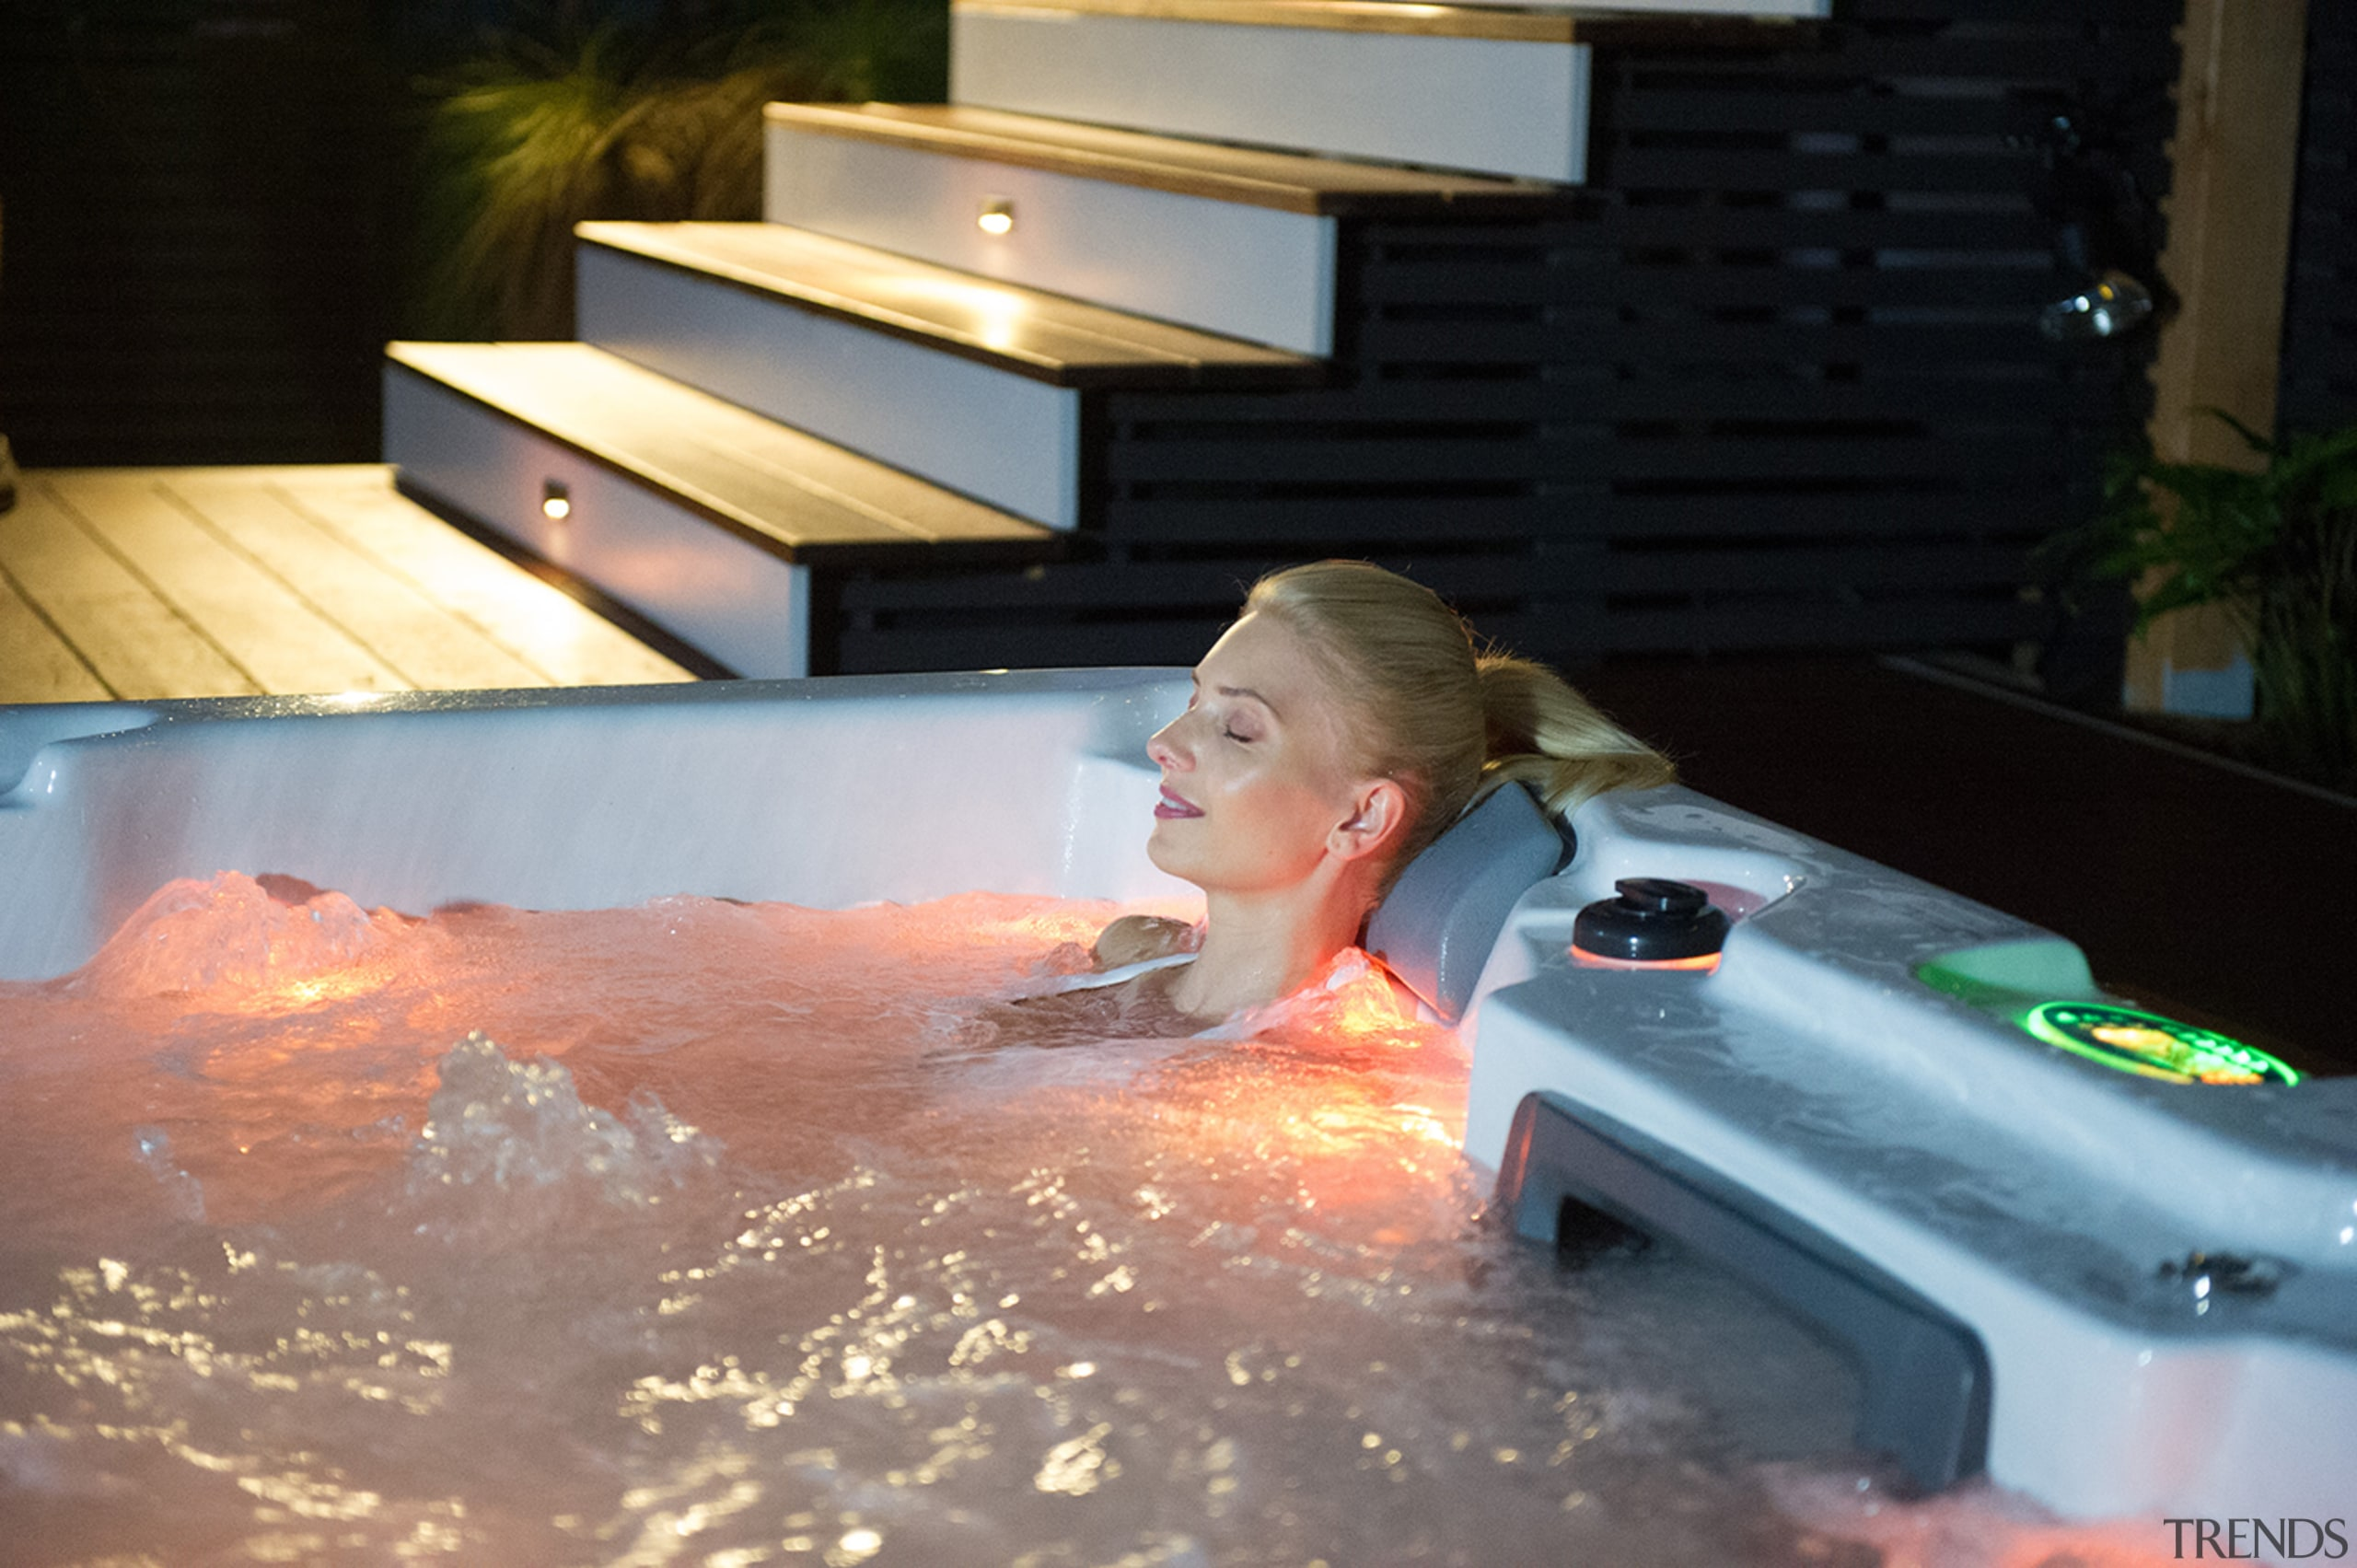 Oasis 096 - bathtub | fun | hot bathtub, fun, hot tub, jacuzzi, leisure, swimming pool, water, black, gray